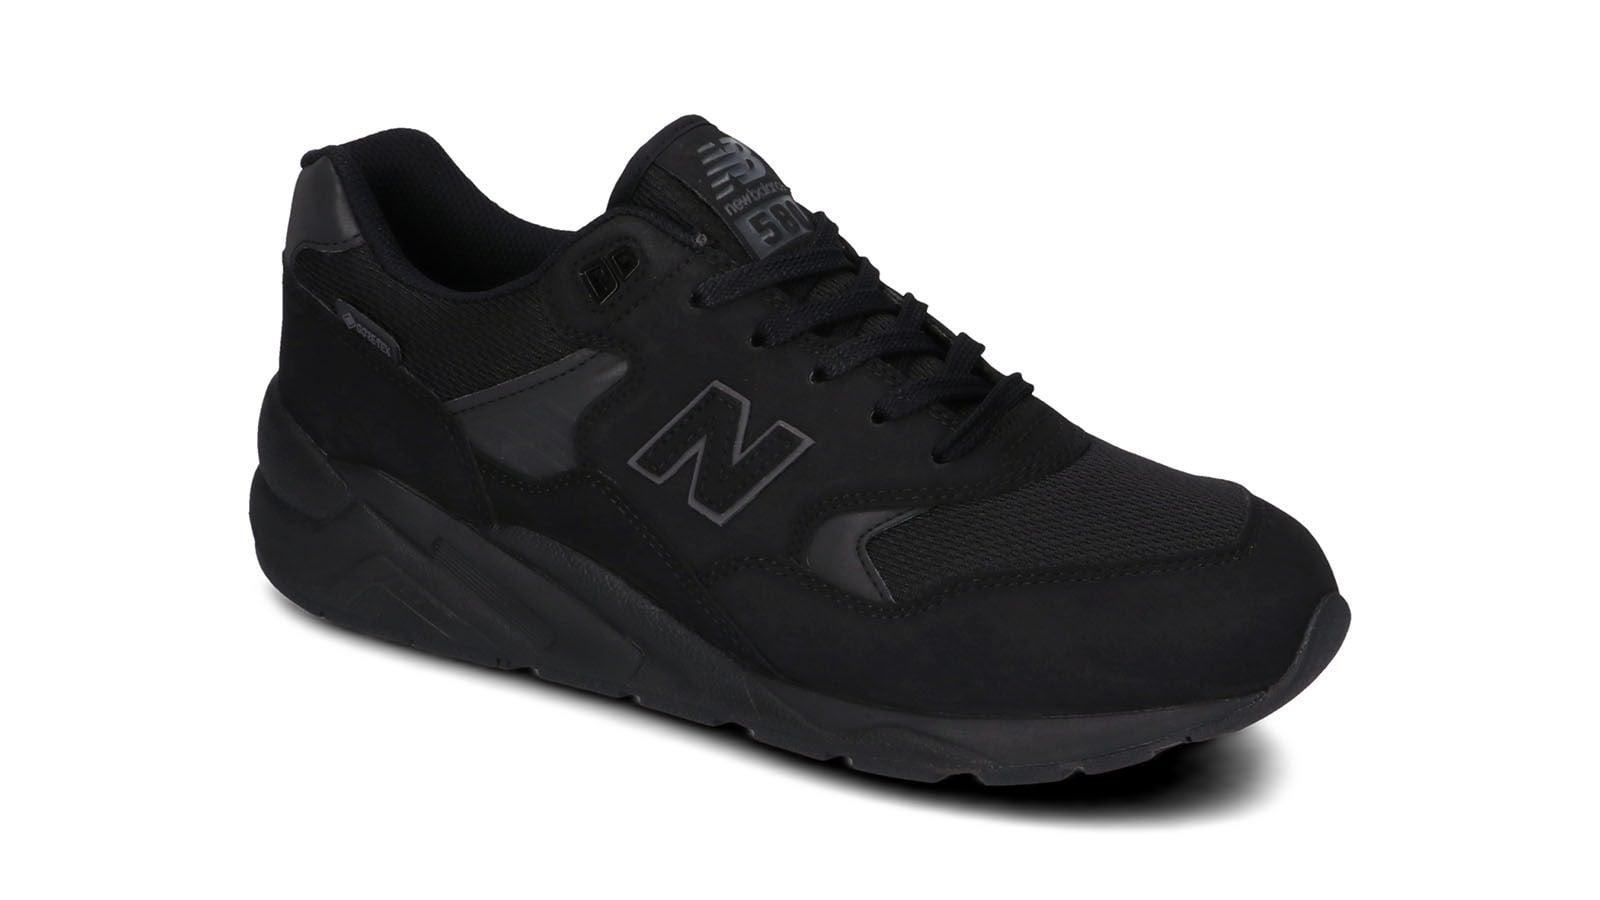 NB公式】ニューバランス |MTX580GA:シューズ| New Balance【公式通販】